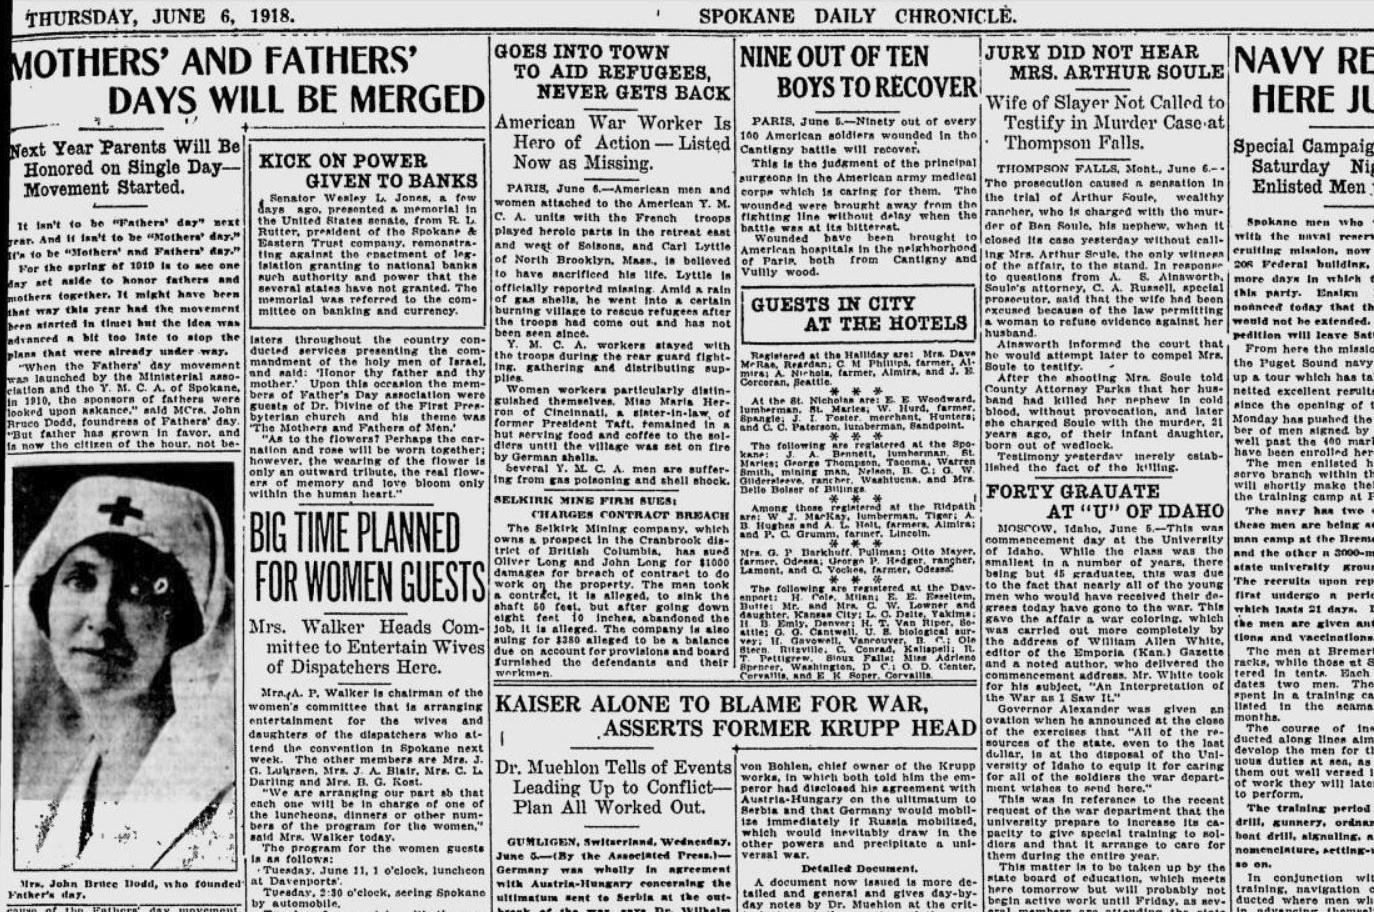 100 years ago in Spokane: Sonora Smart Dodd backs plan to ...